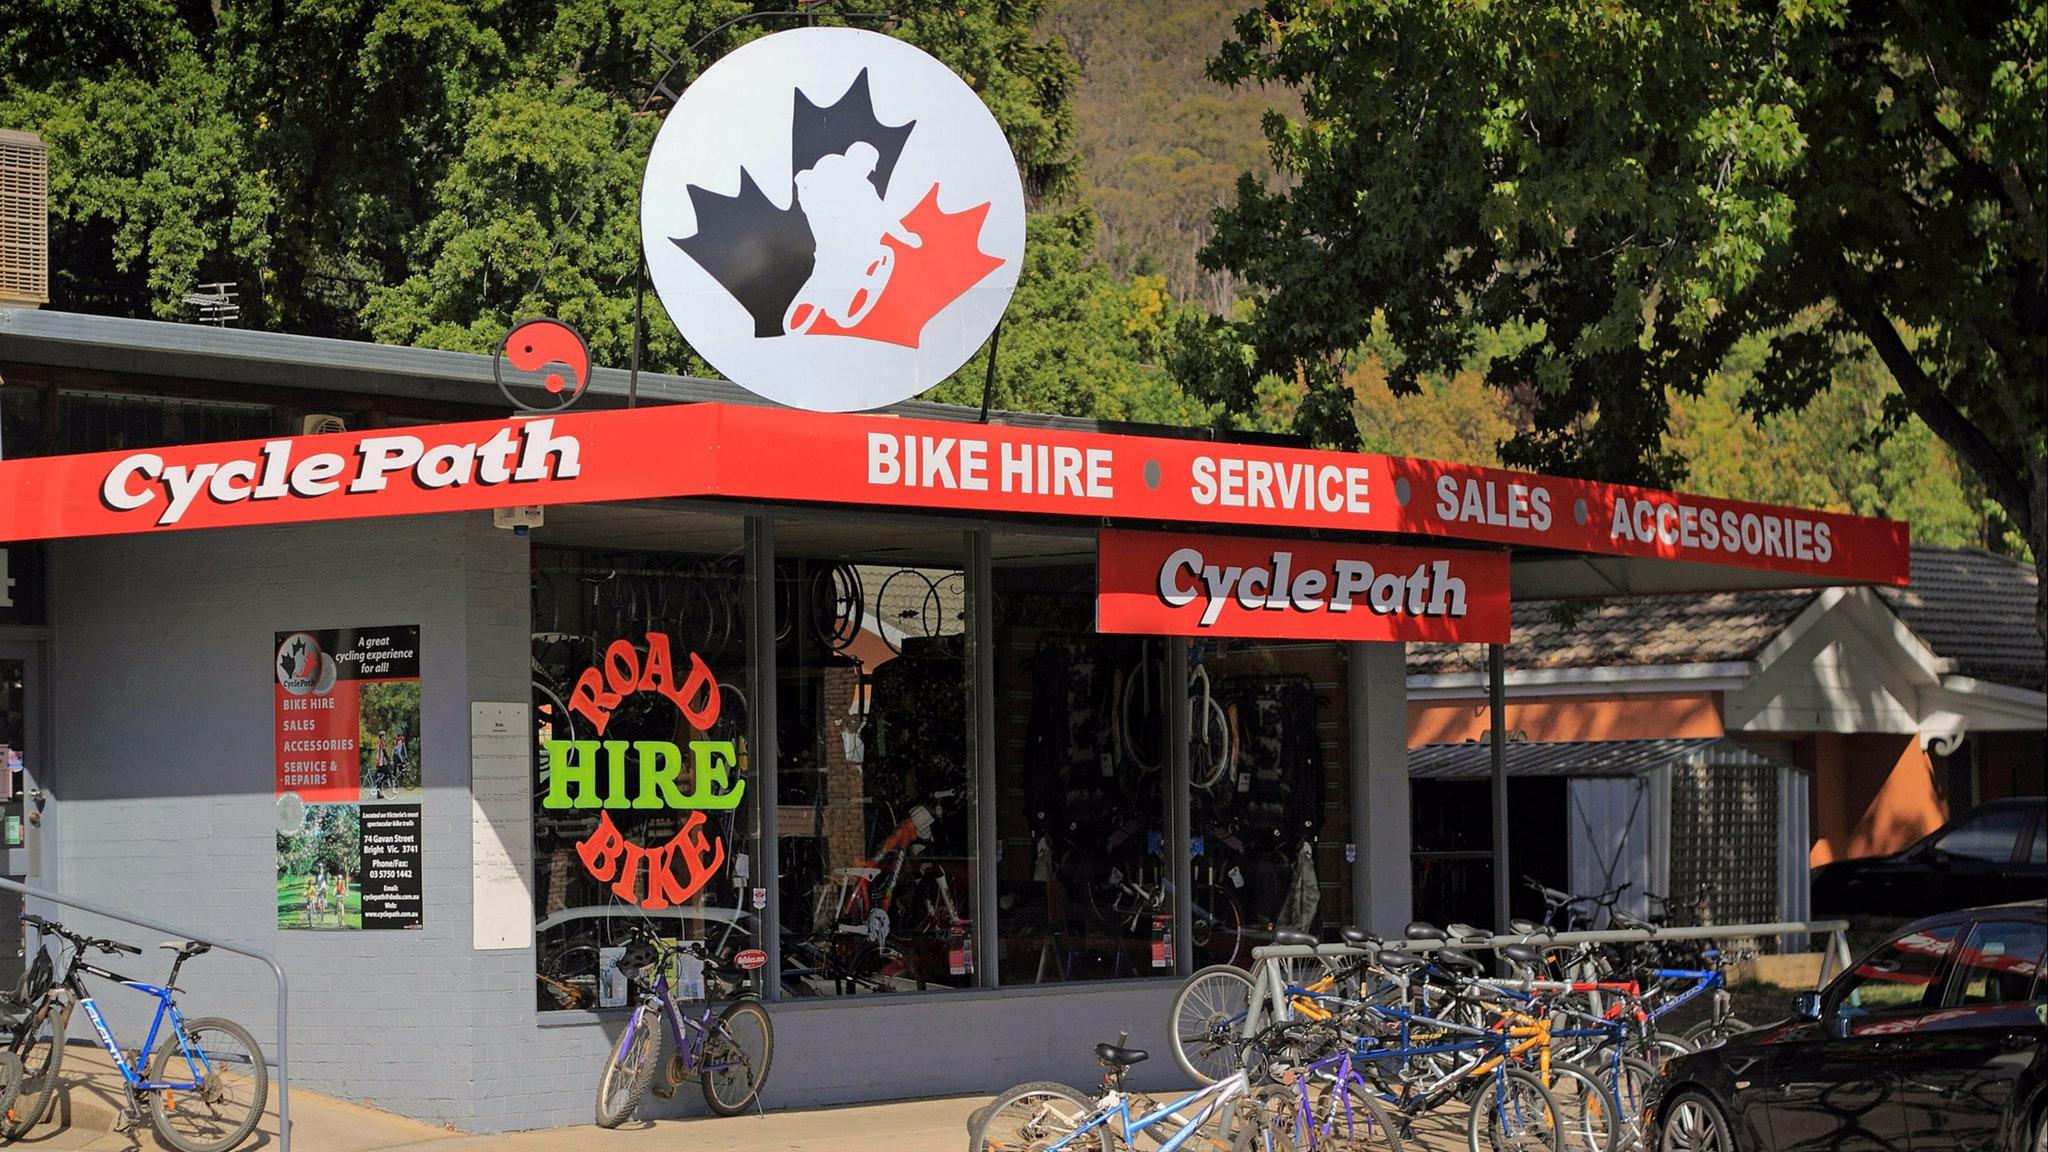 Cyclepath Bright Bike Shop